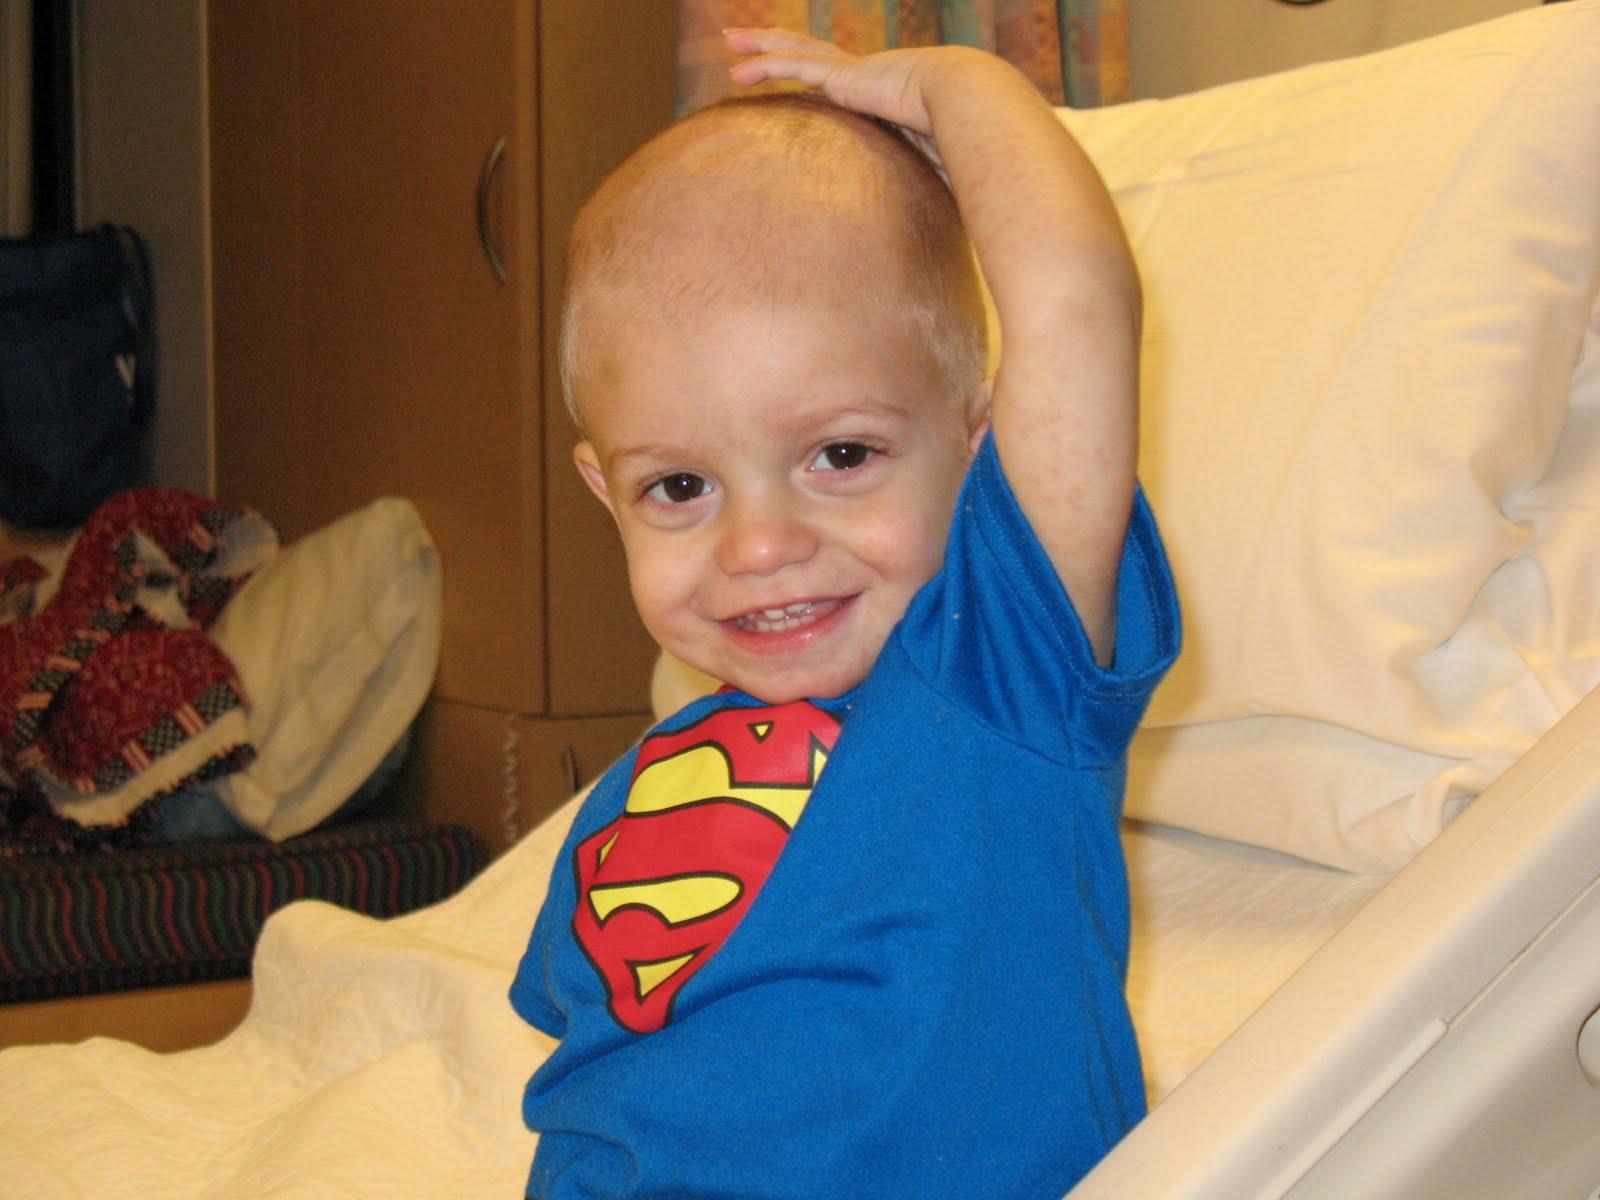 leukemia children emf fields Childhood Leukemia And Electromagnetic Fields